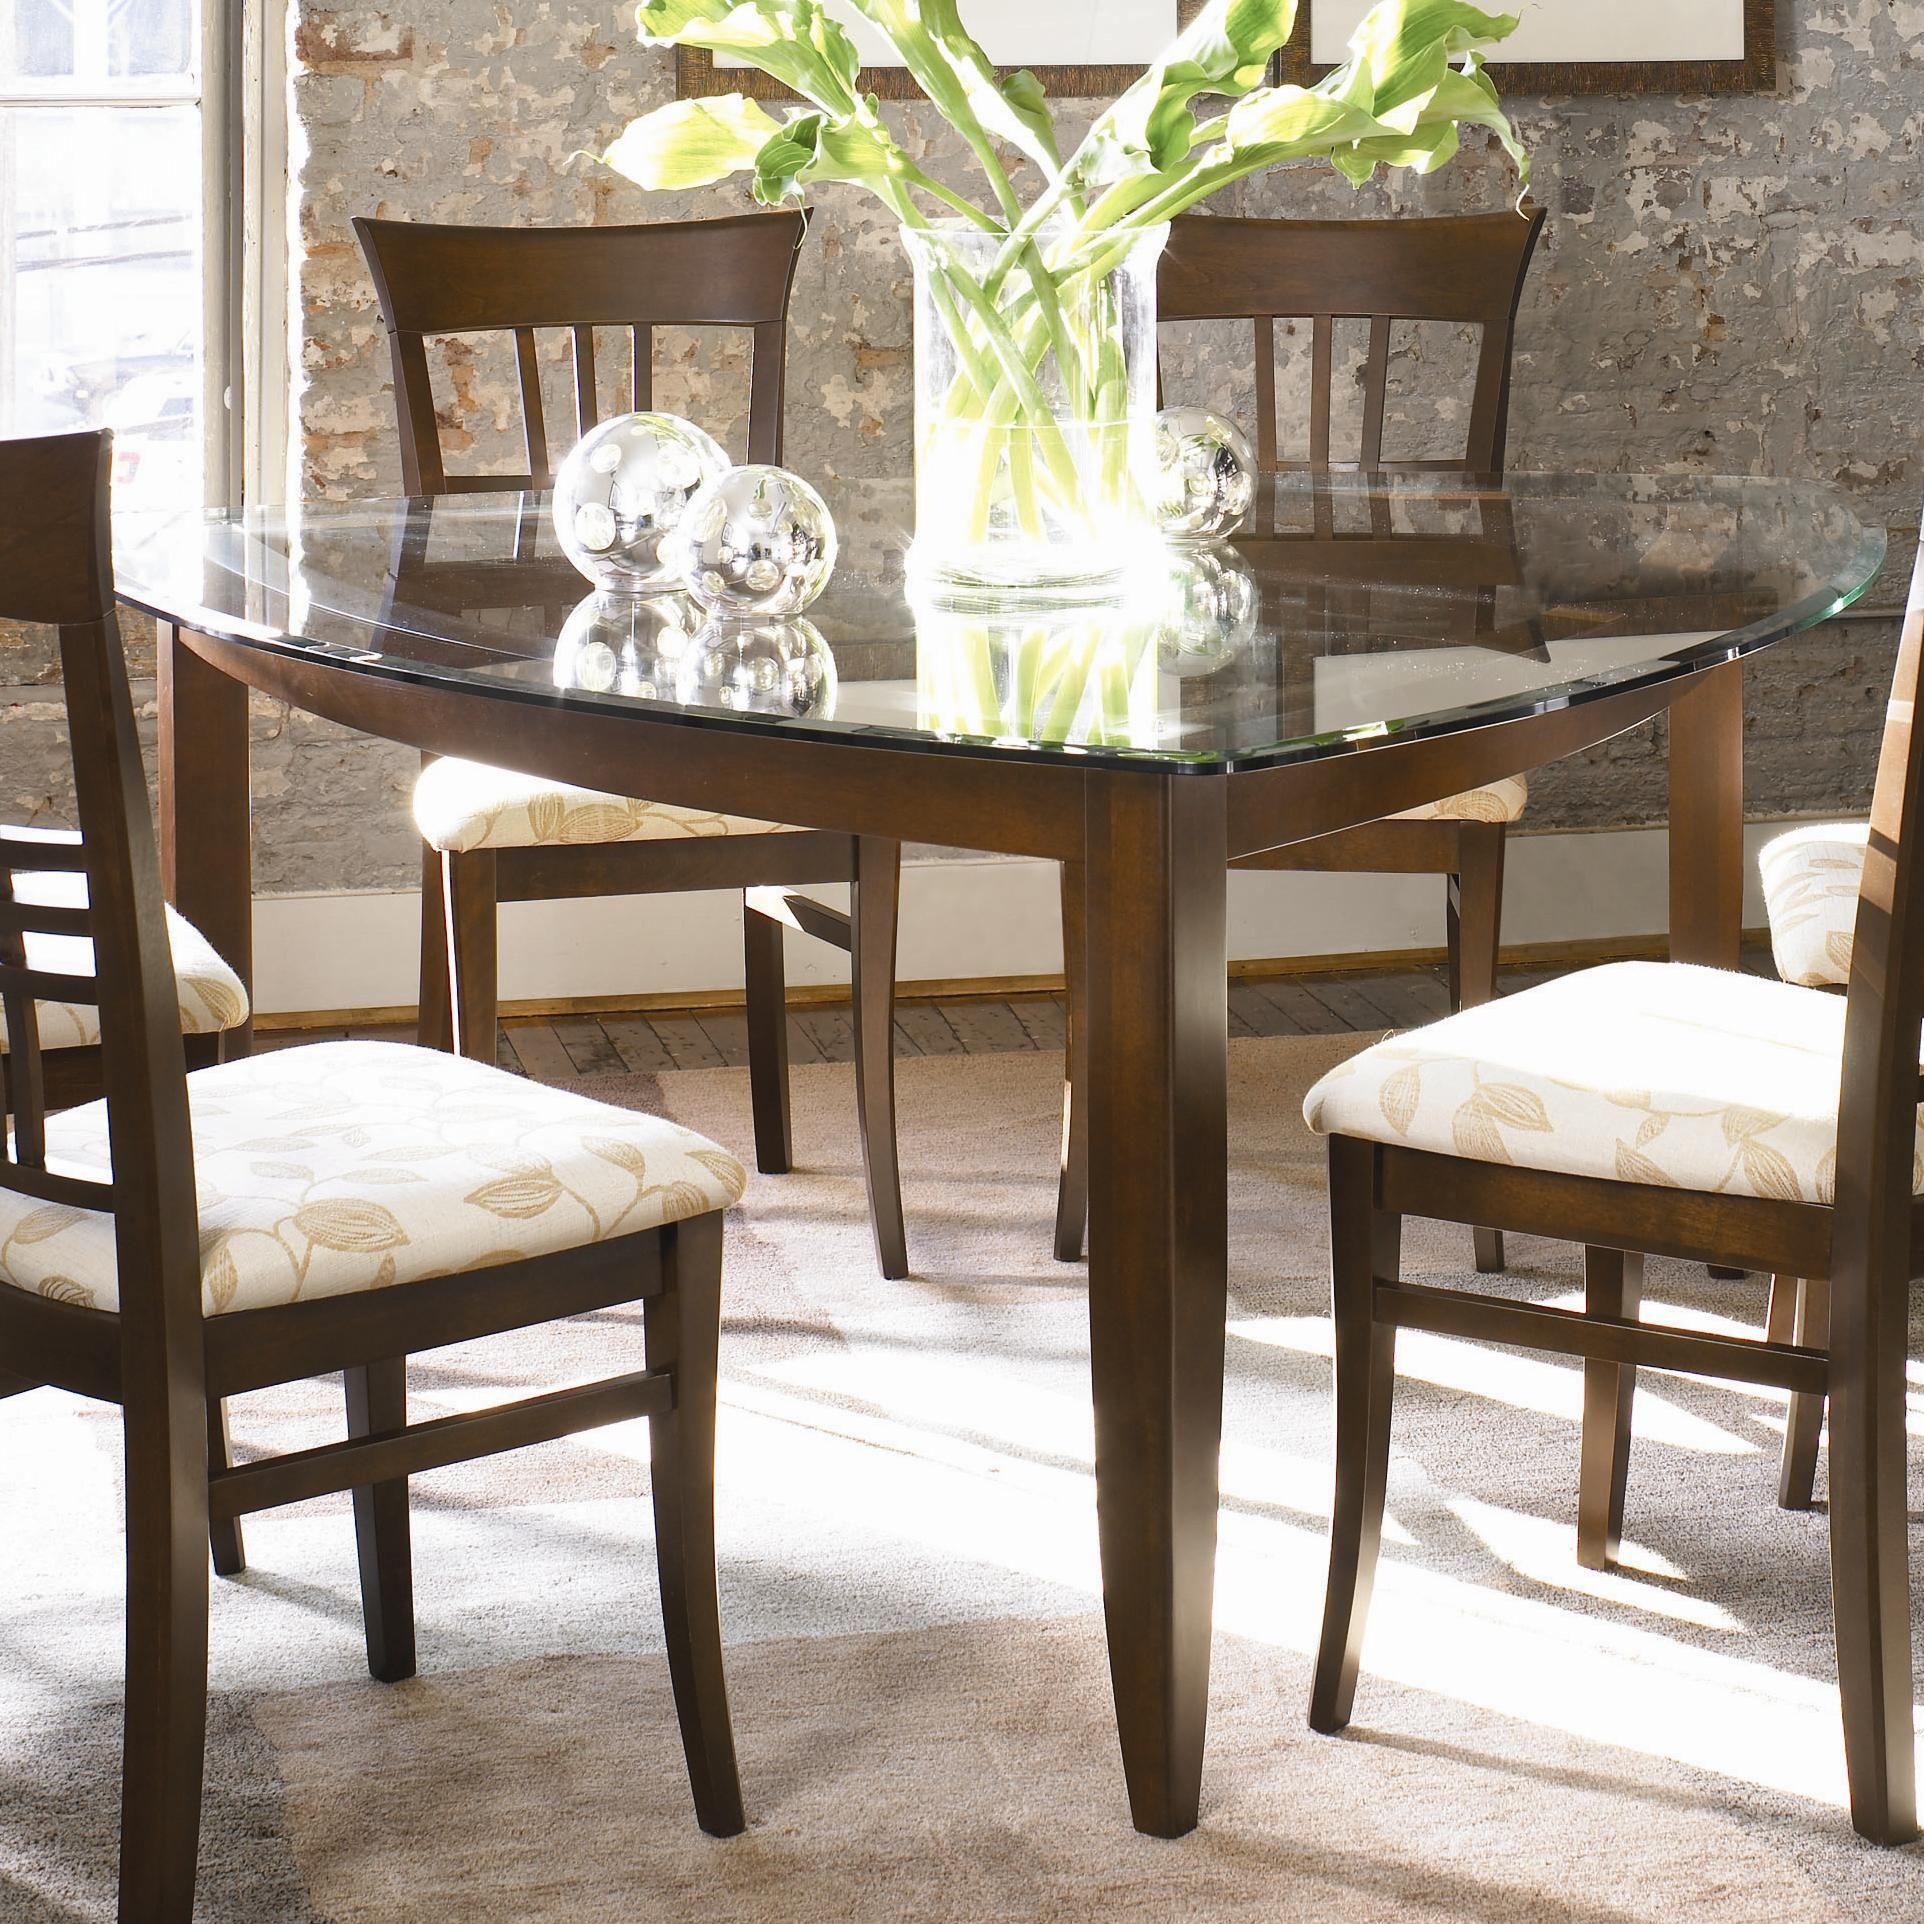 Color Café   Custom Dining U003cBu003eCustomizableu003c/Bu003e Triangular Table By  Thomasville®